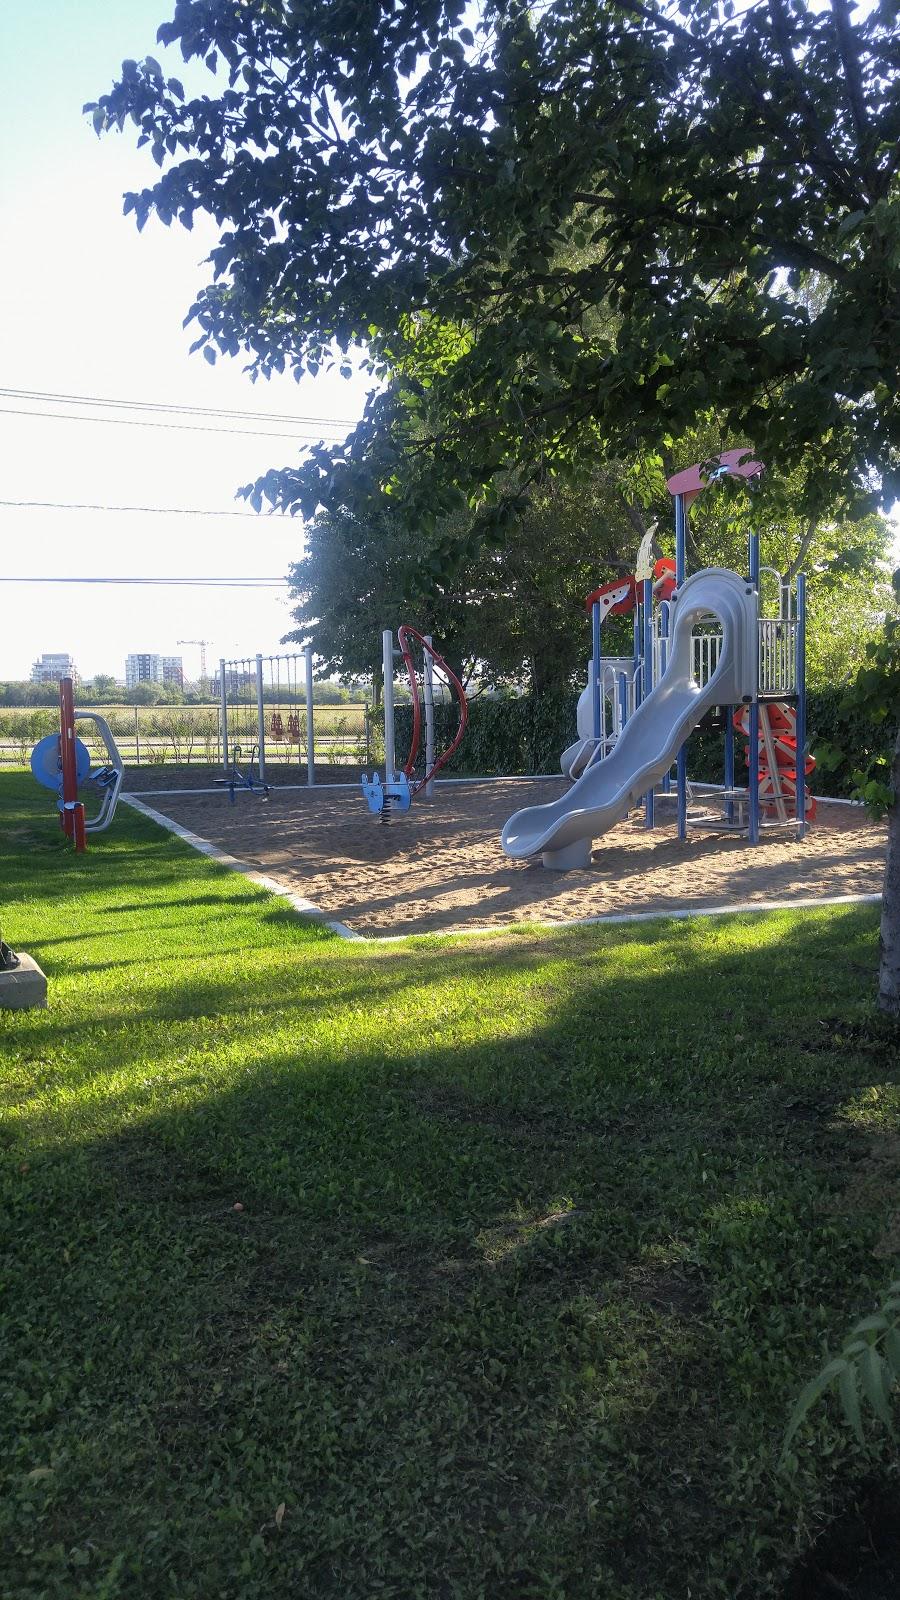 Parc de la Labourrasque | park | 3320 Avenue Mallet, Québec, QC G1C 3Y7, Canada